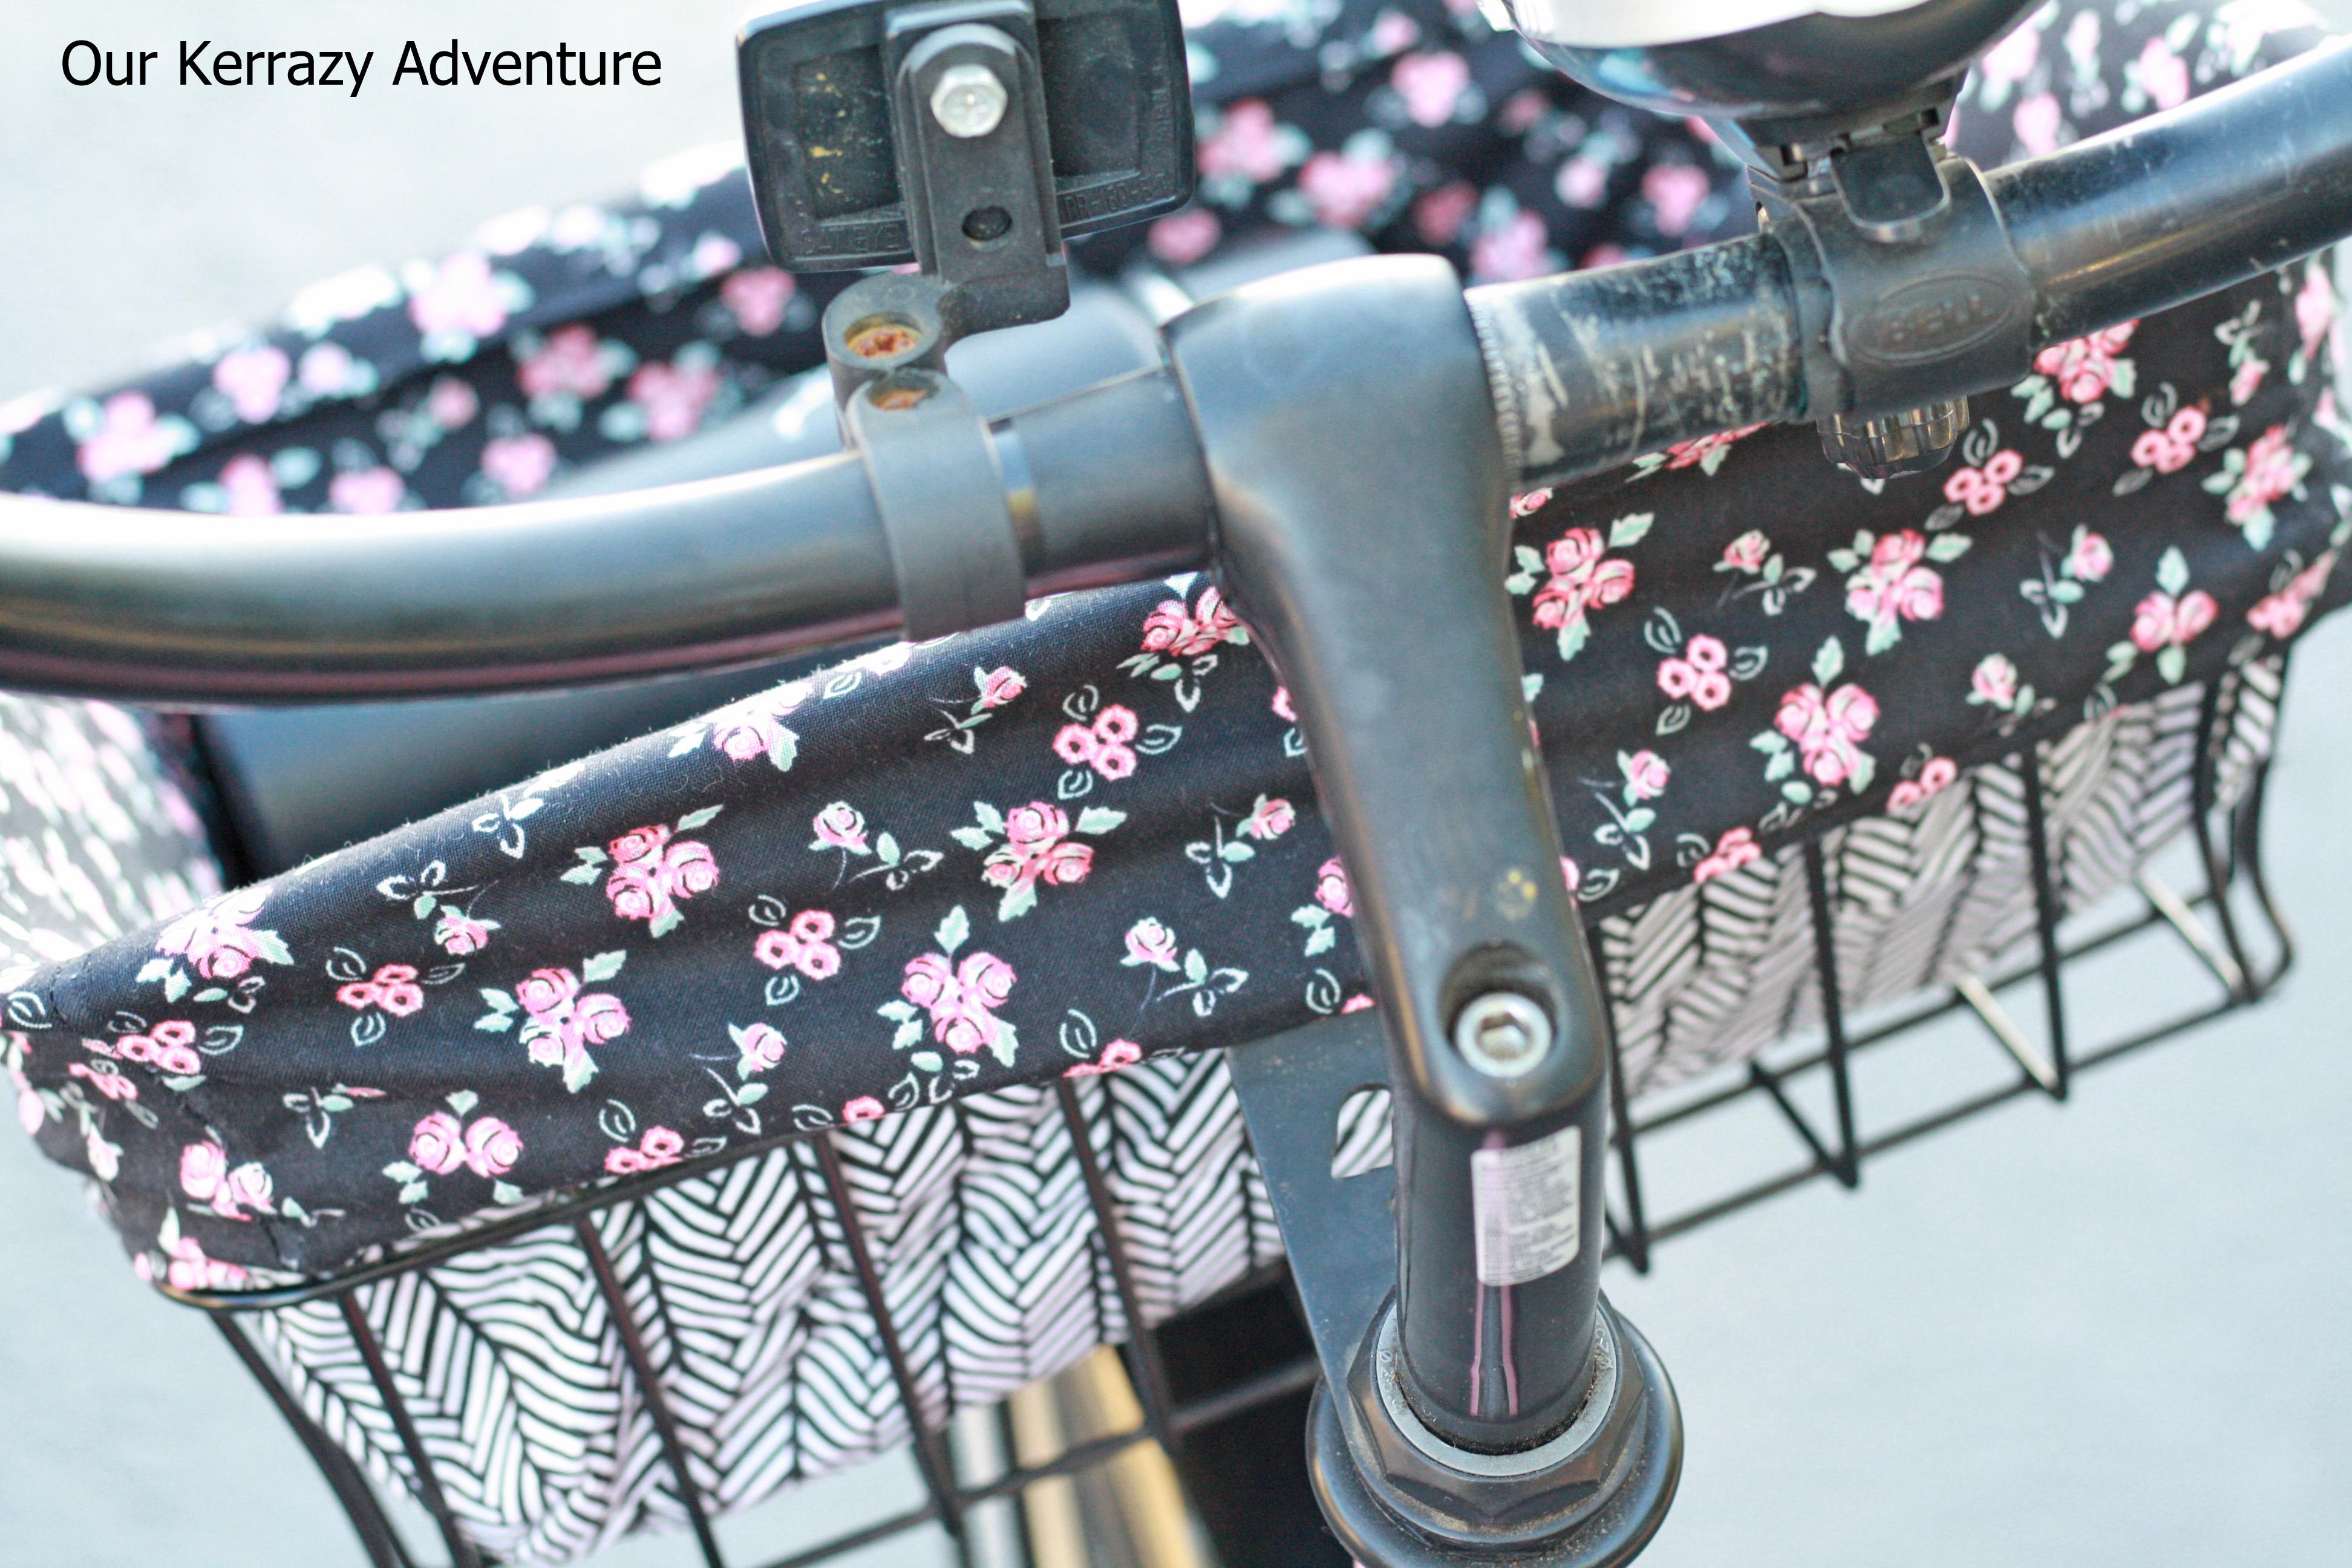 Diy bicycle basket liner tutorial our kerrazy adventure.